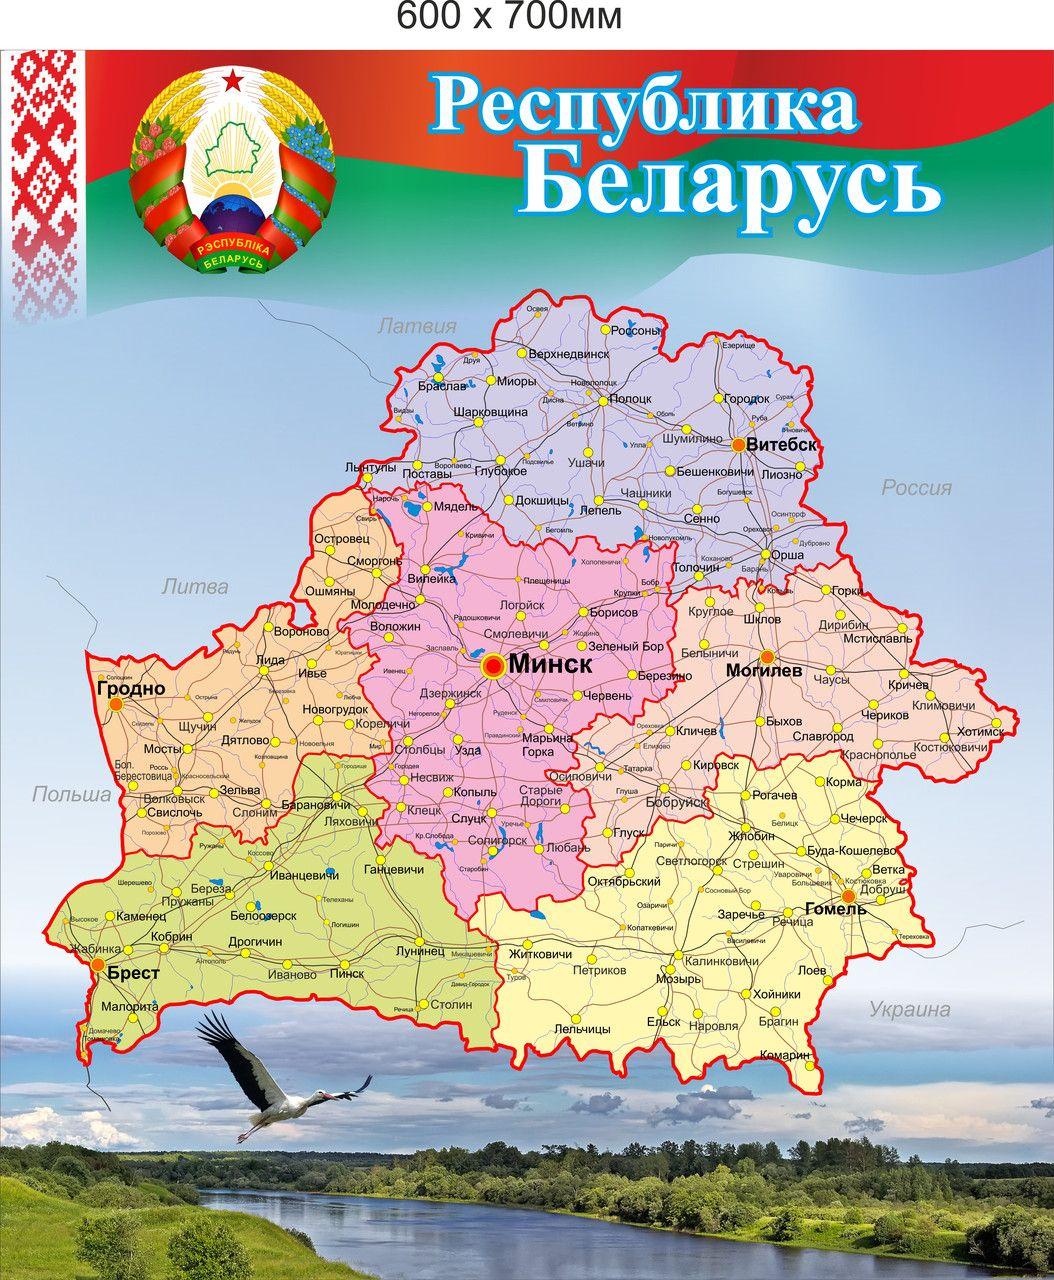 Подробная карта беларуси картинка